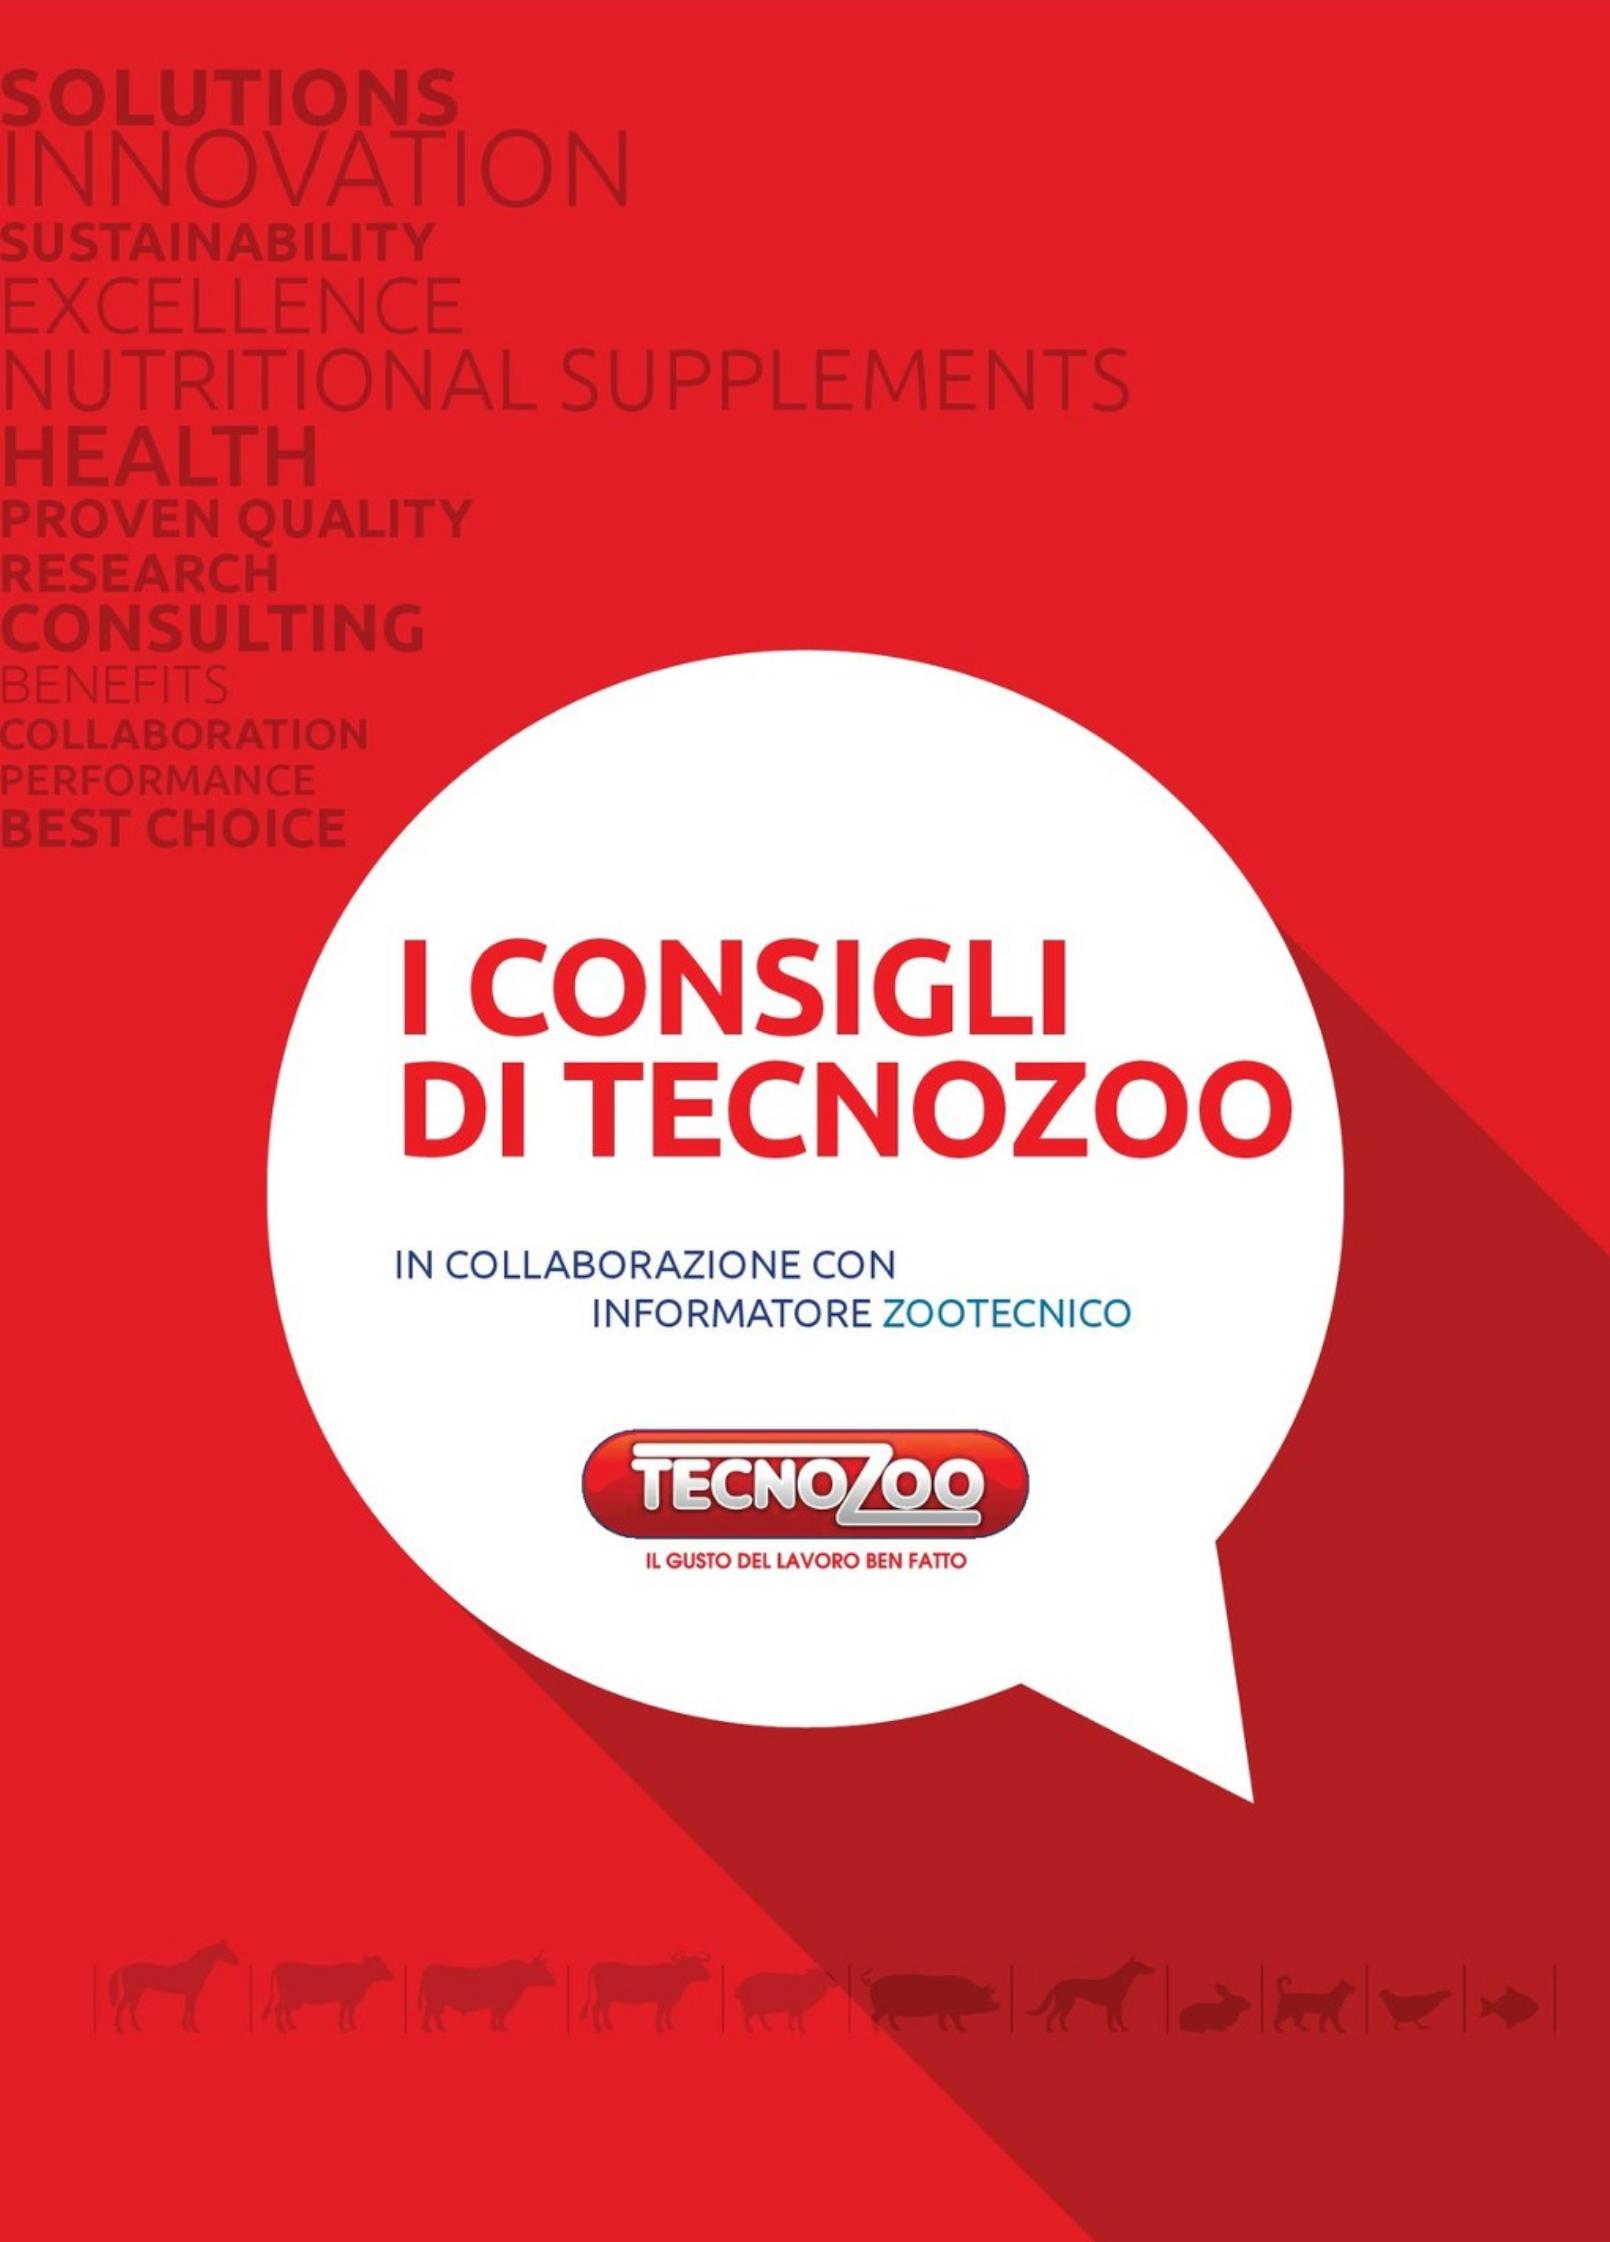 Tecnozoo_i consigli